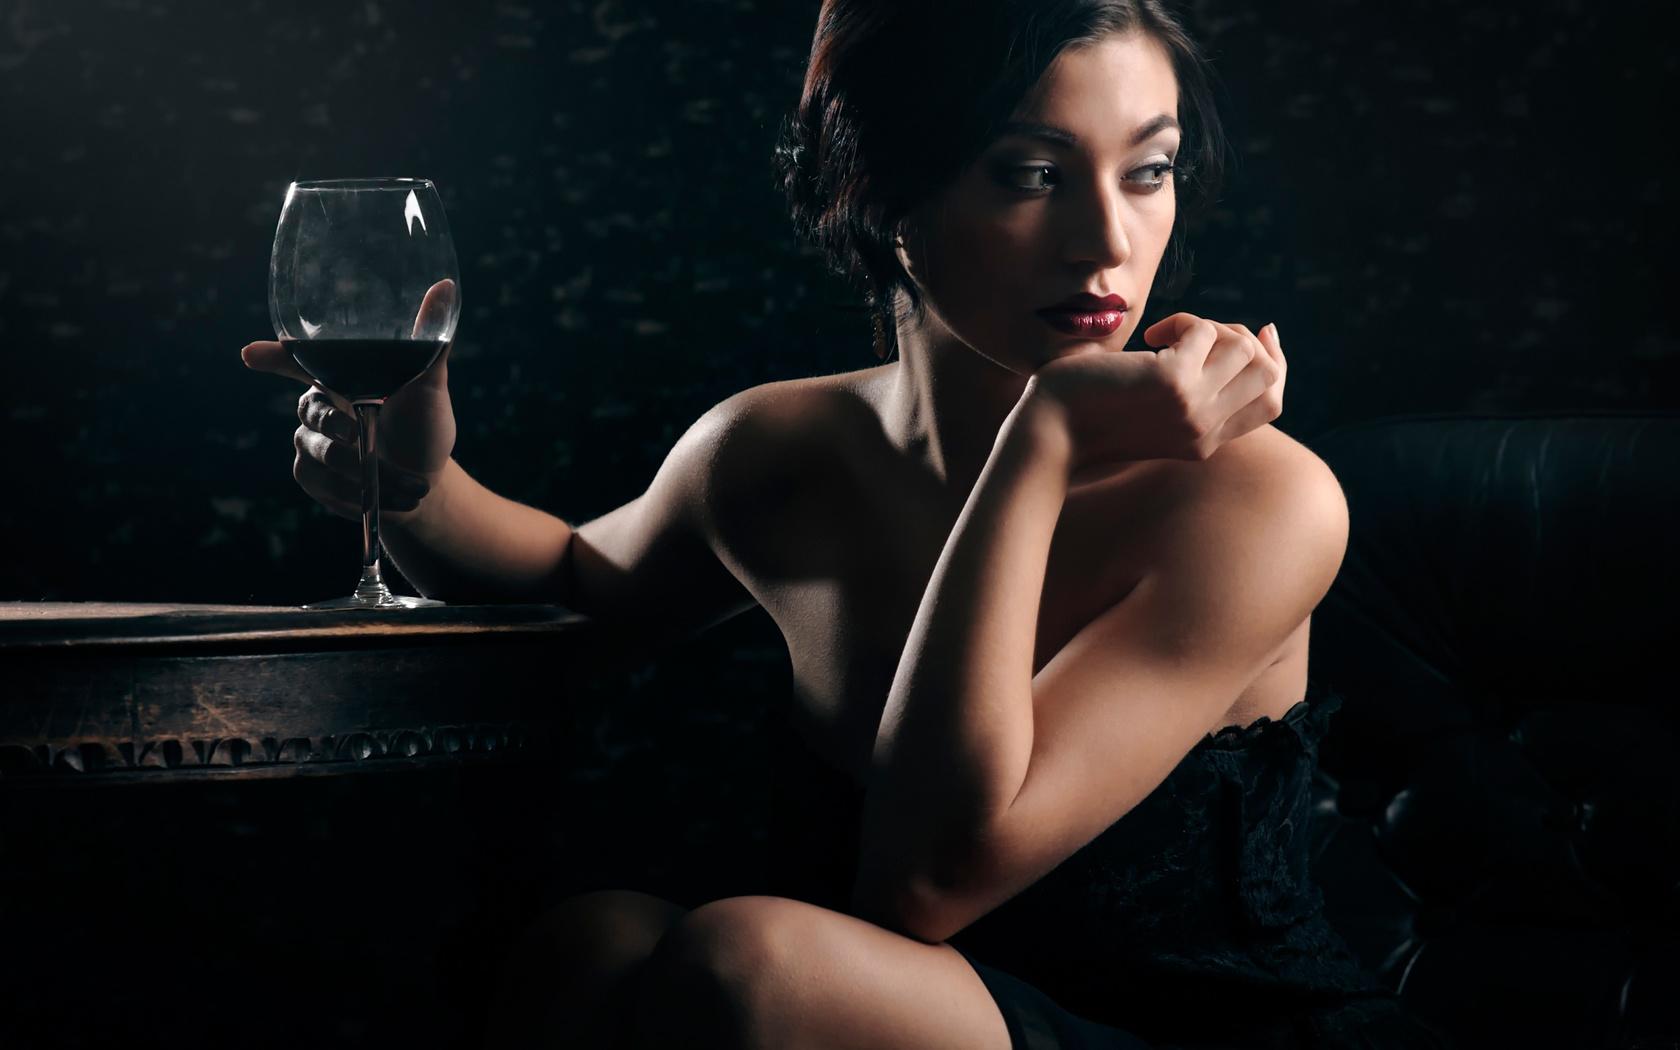 Картинки про вино и девушек